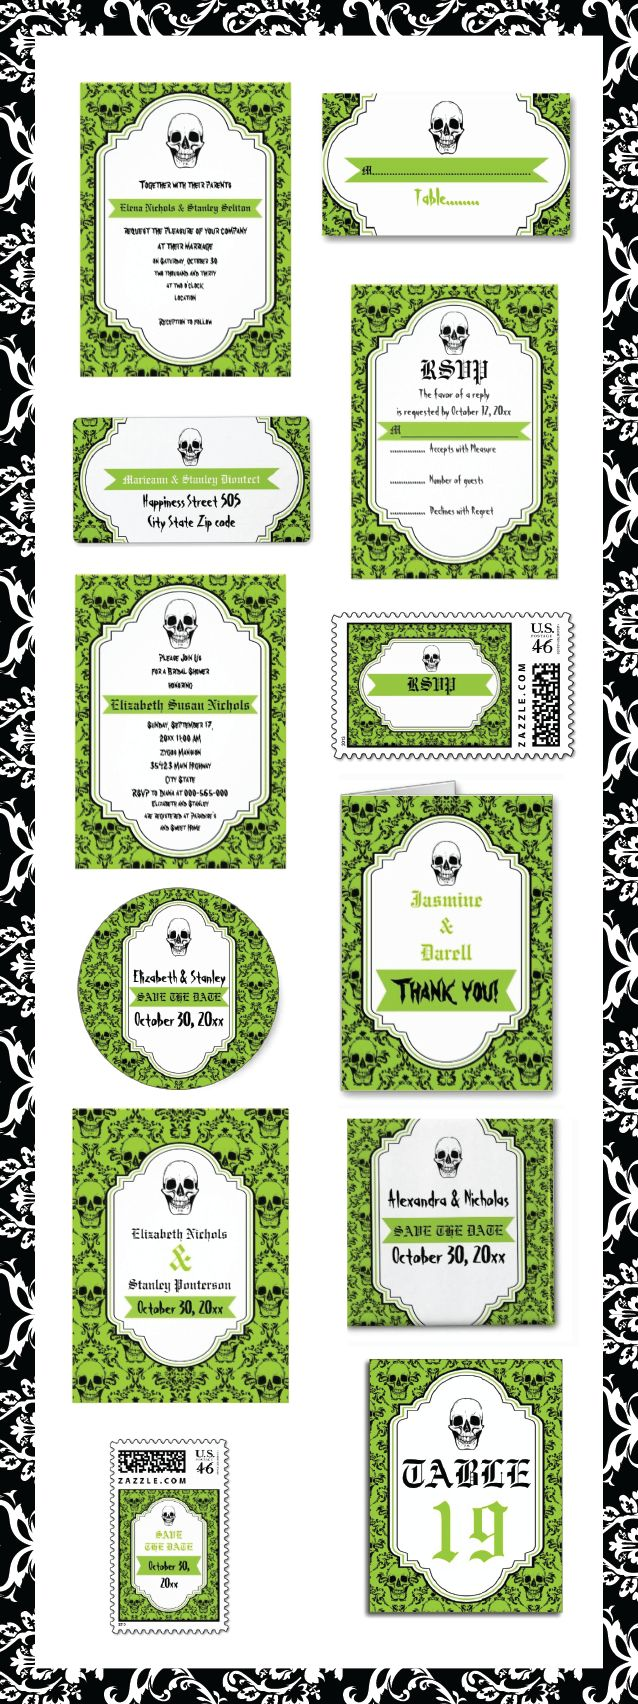 skull halloween wedding theme skull wedding invitations Skulls damask green black Halloween Gothic wedding invitations and matching stationery weddinginvitations